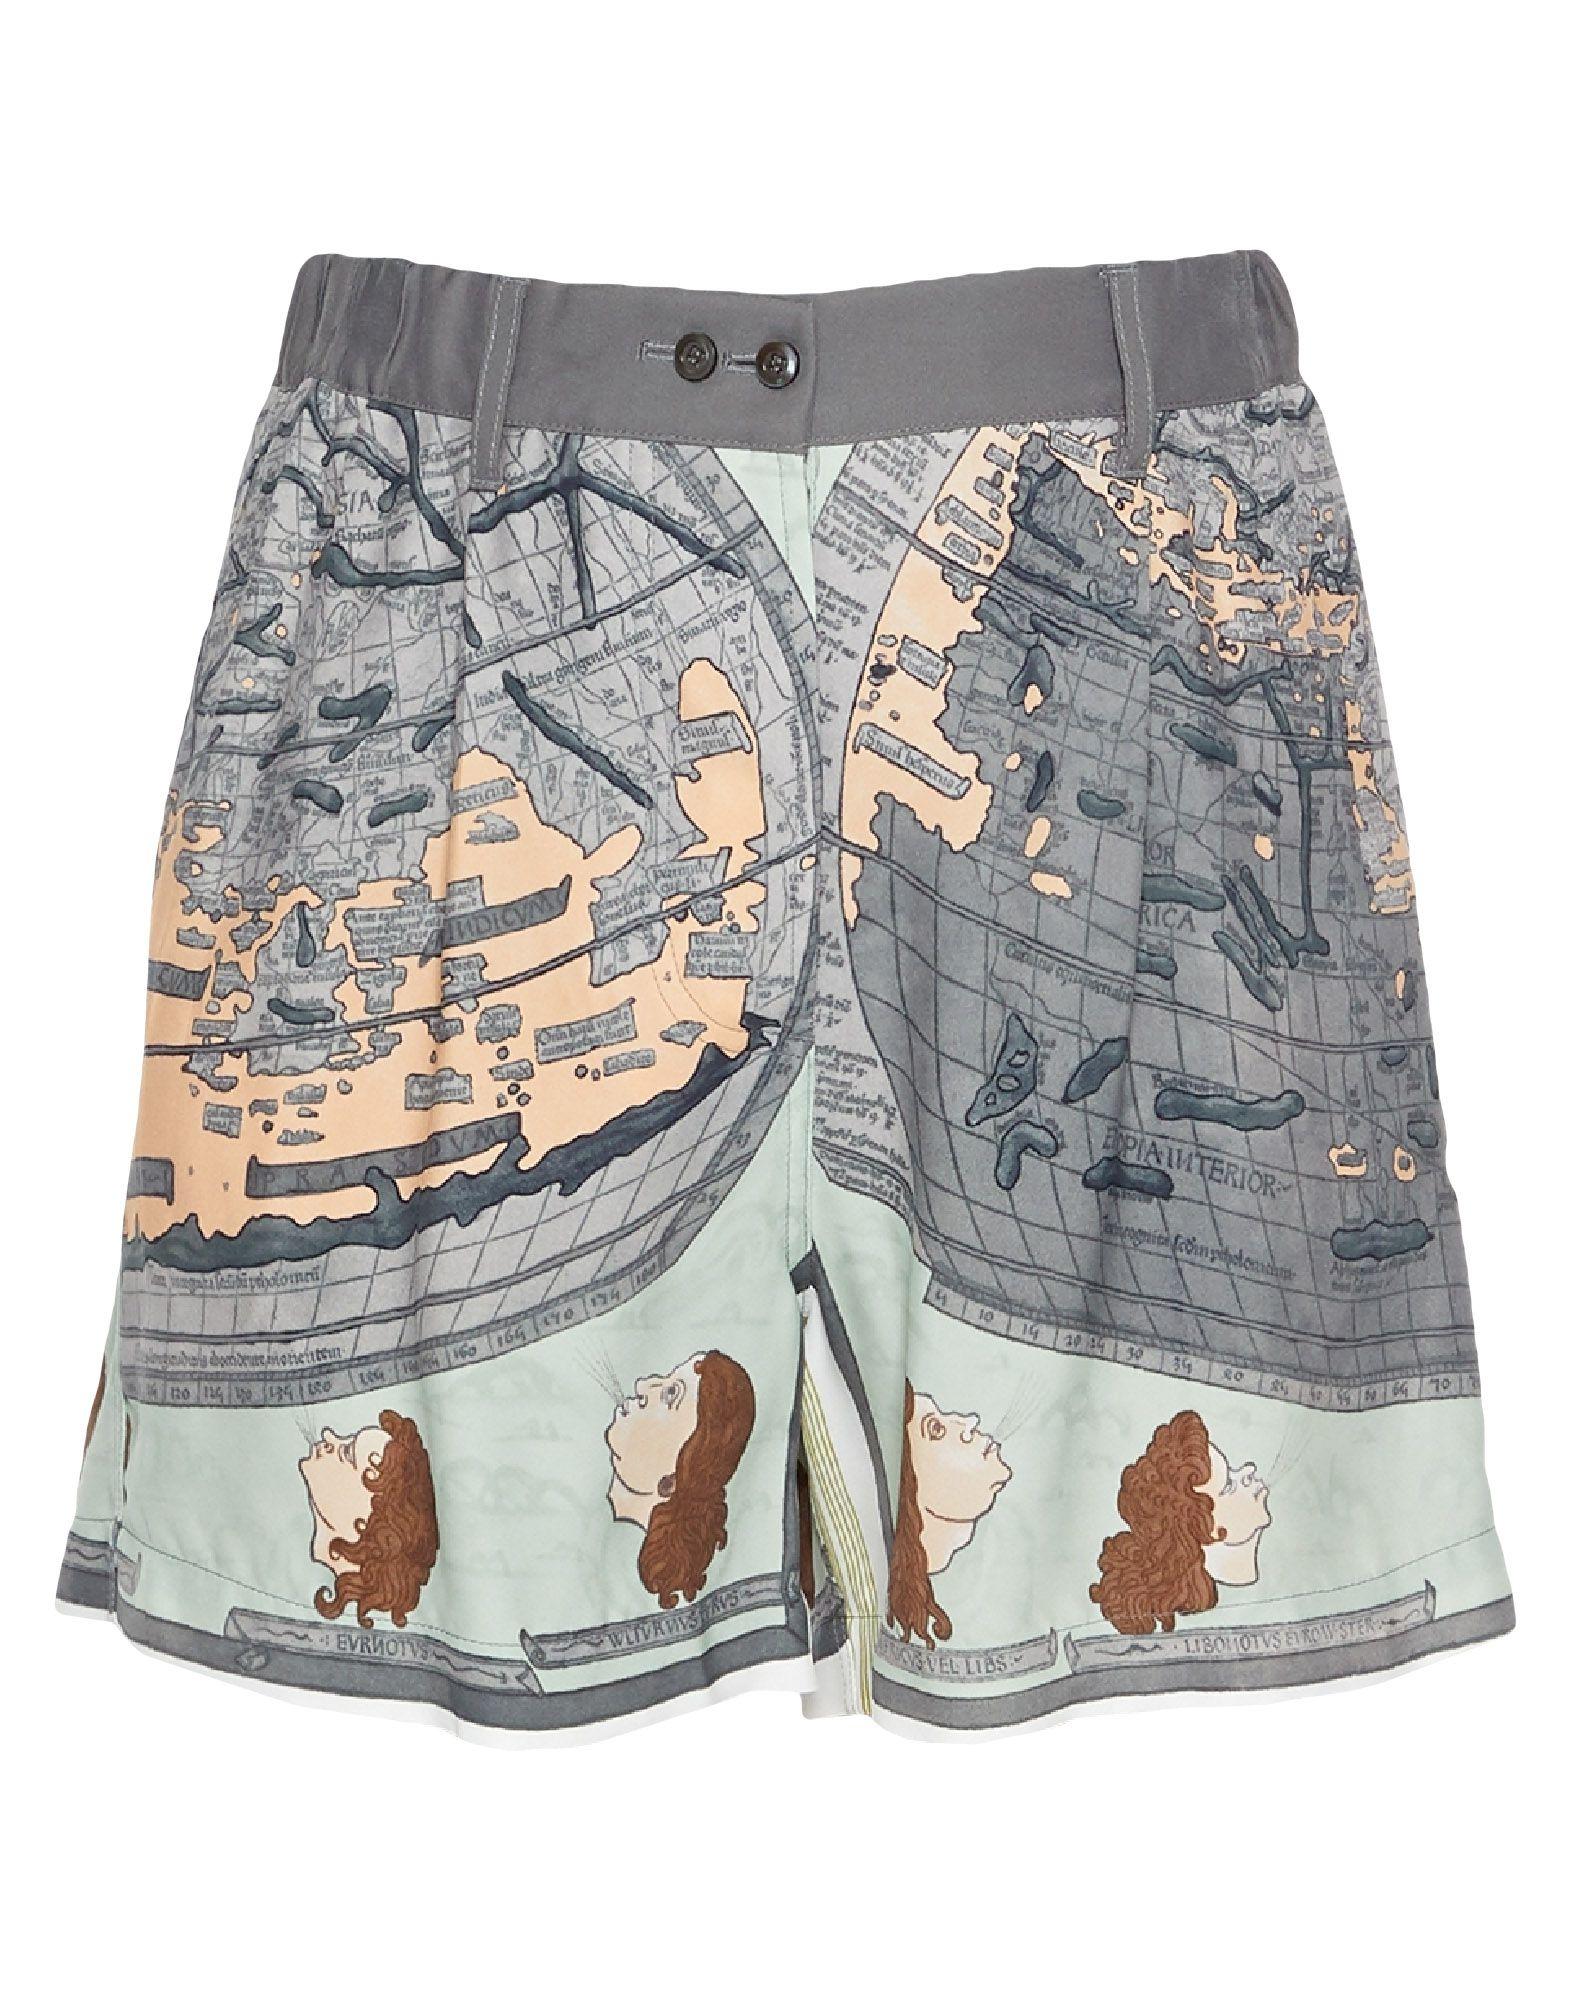 SANTONI Shorts. crepe, multicolor pattern, regular fit, high waisted, straight leg, single pocket, button closing. 100% Viscose